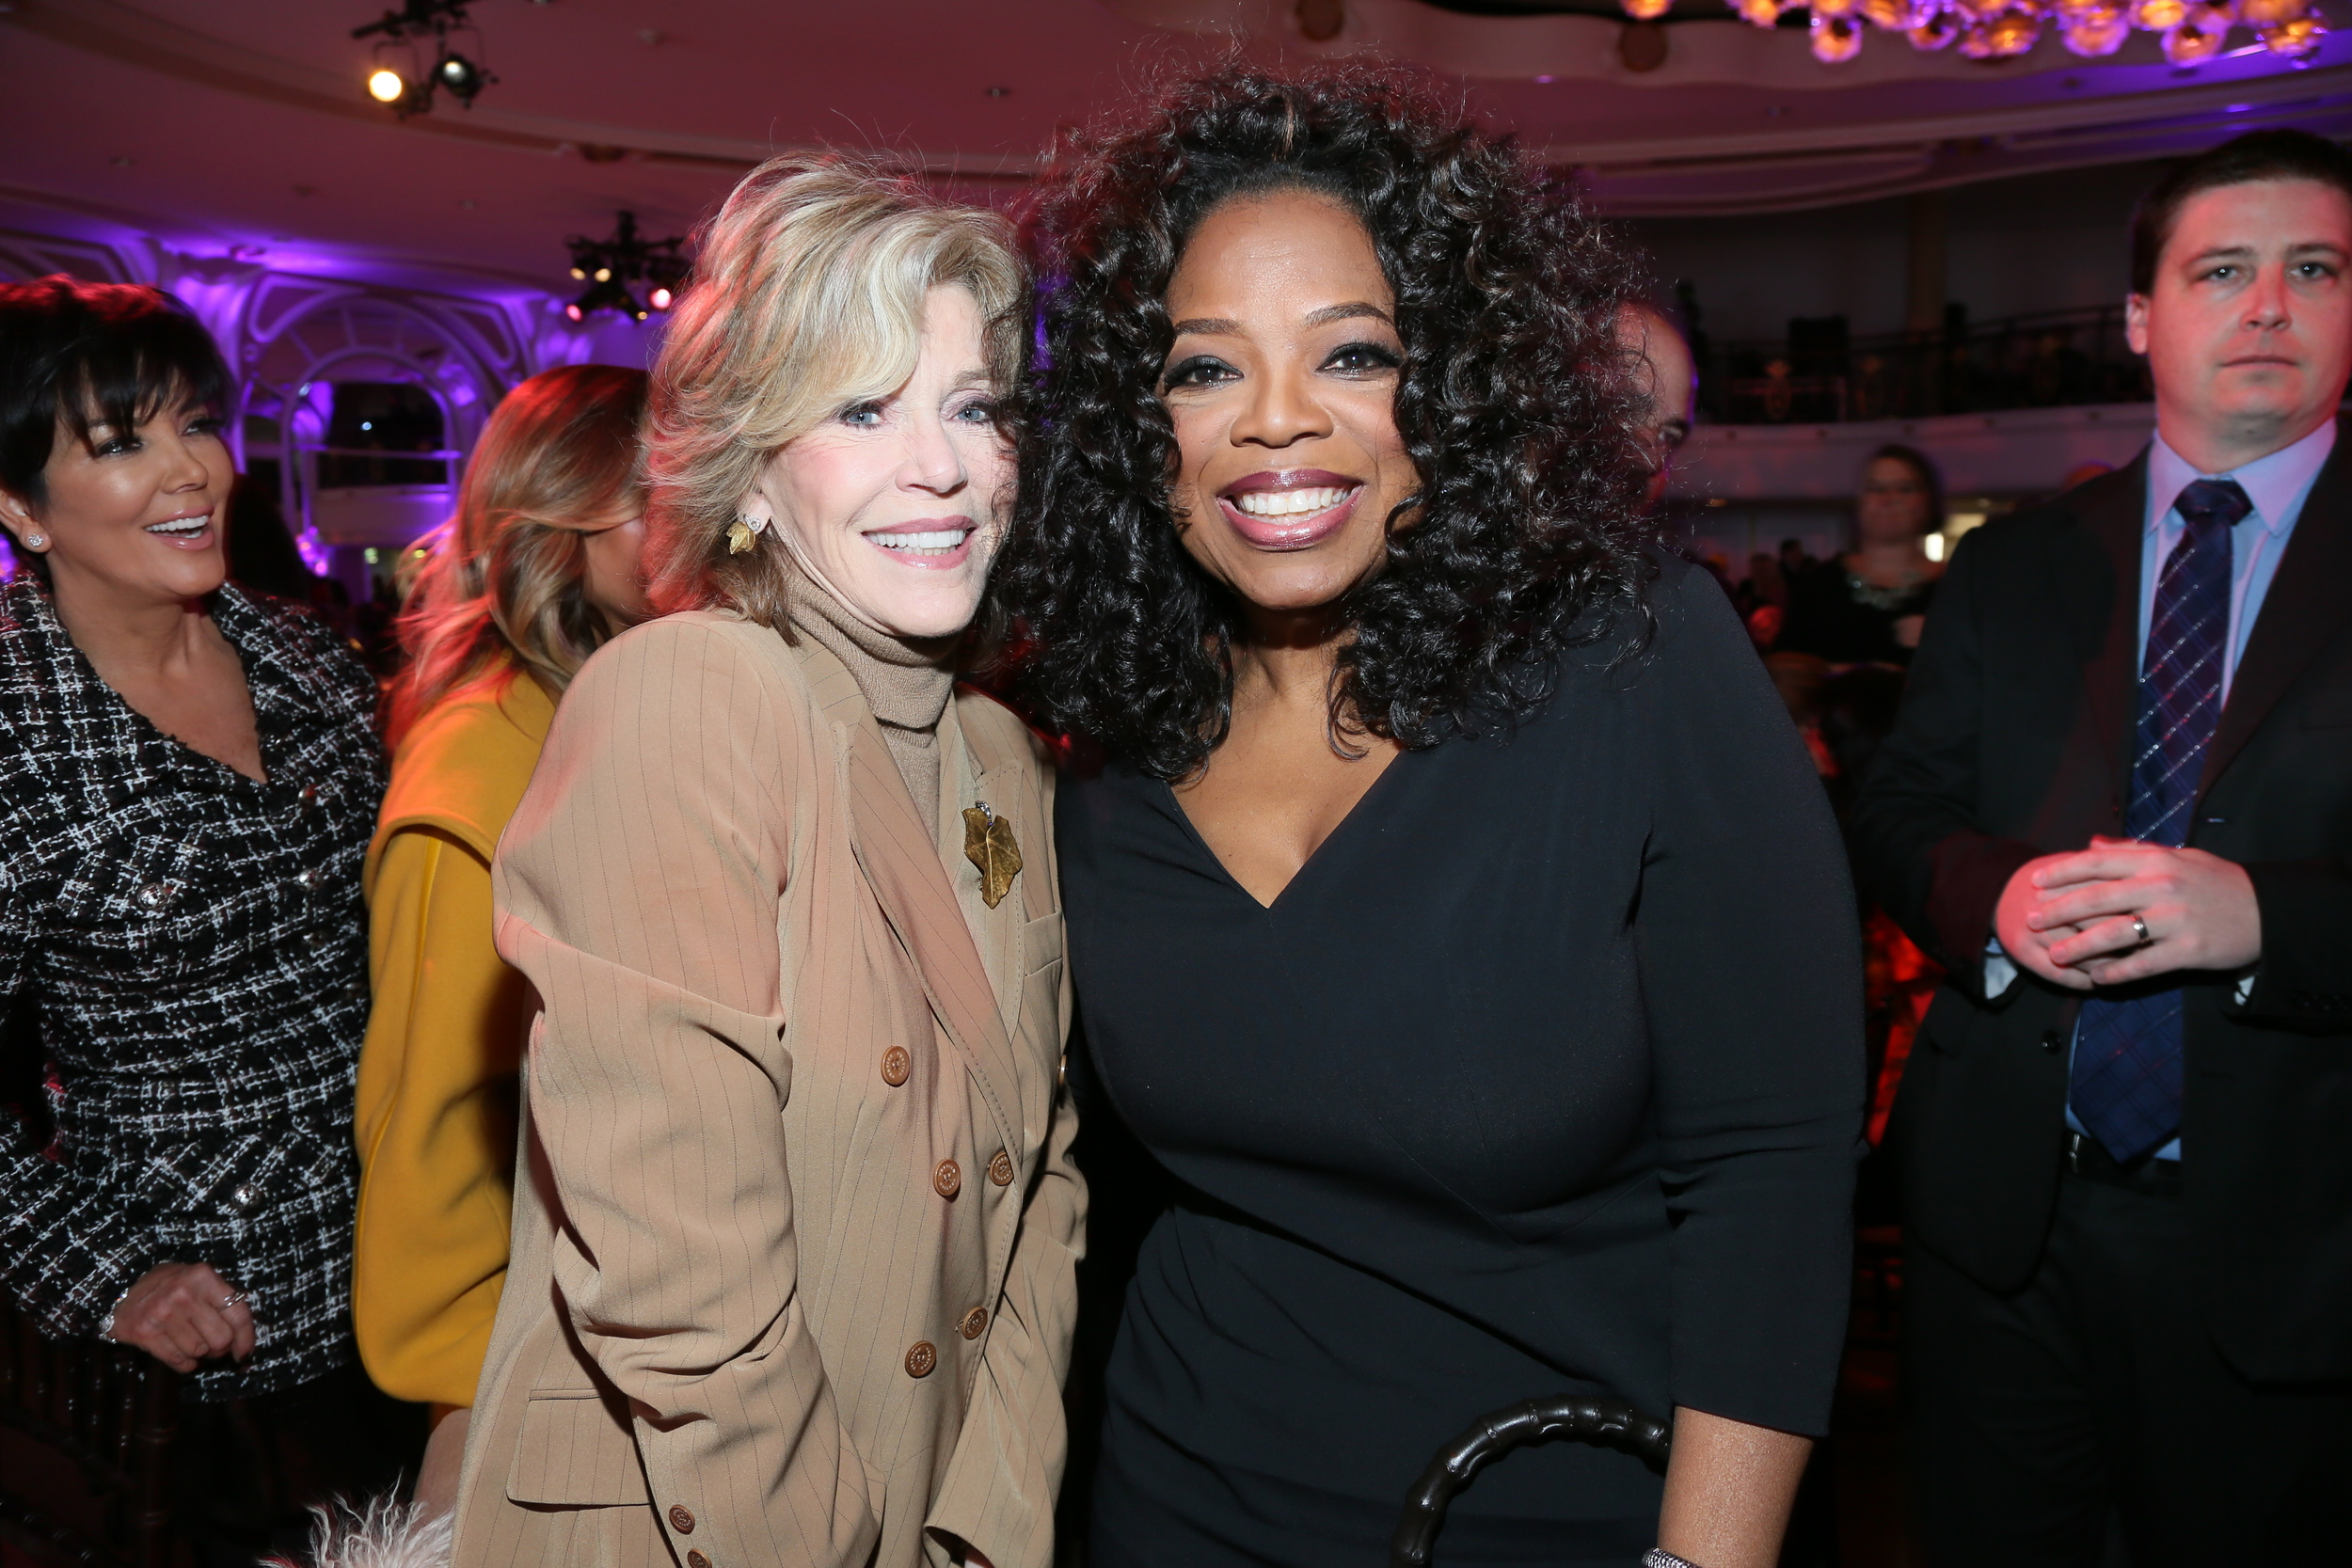 Jane Fonda, Oprah Winfrey